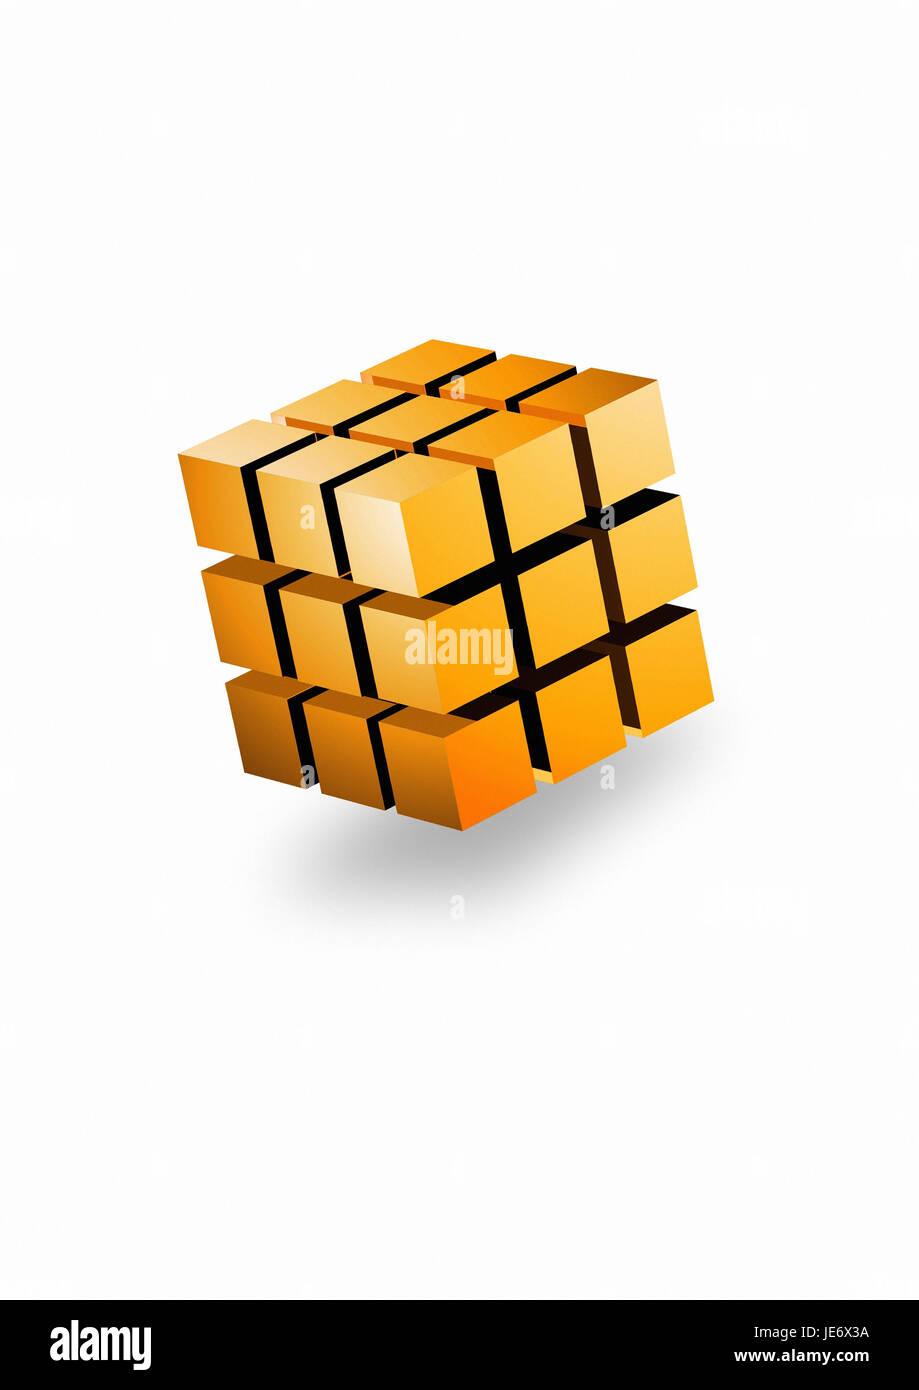 Cube, - Stock Image